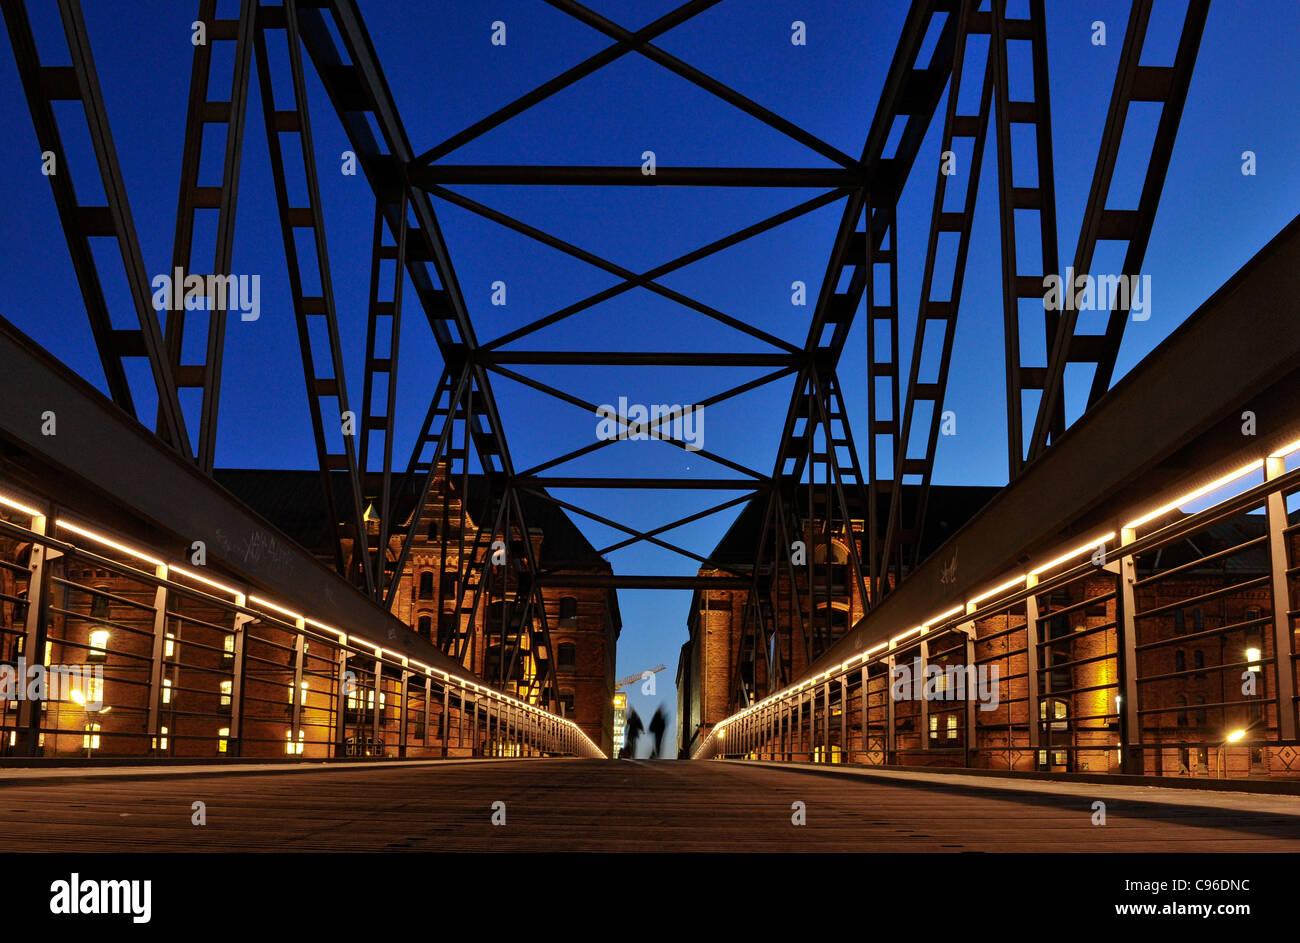 Kibbelstegbruecke bridge, Hafencity district, Hanseatic City of Hamburg, Germany, Europe Stock Photo